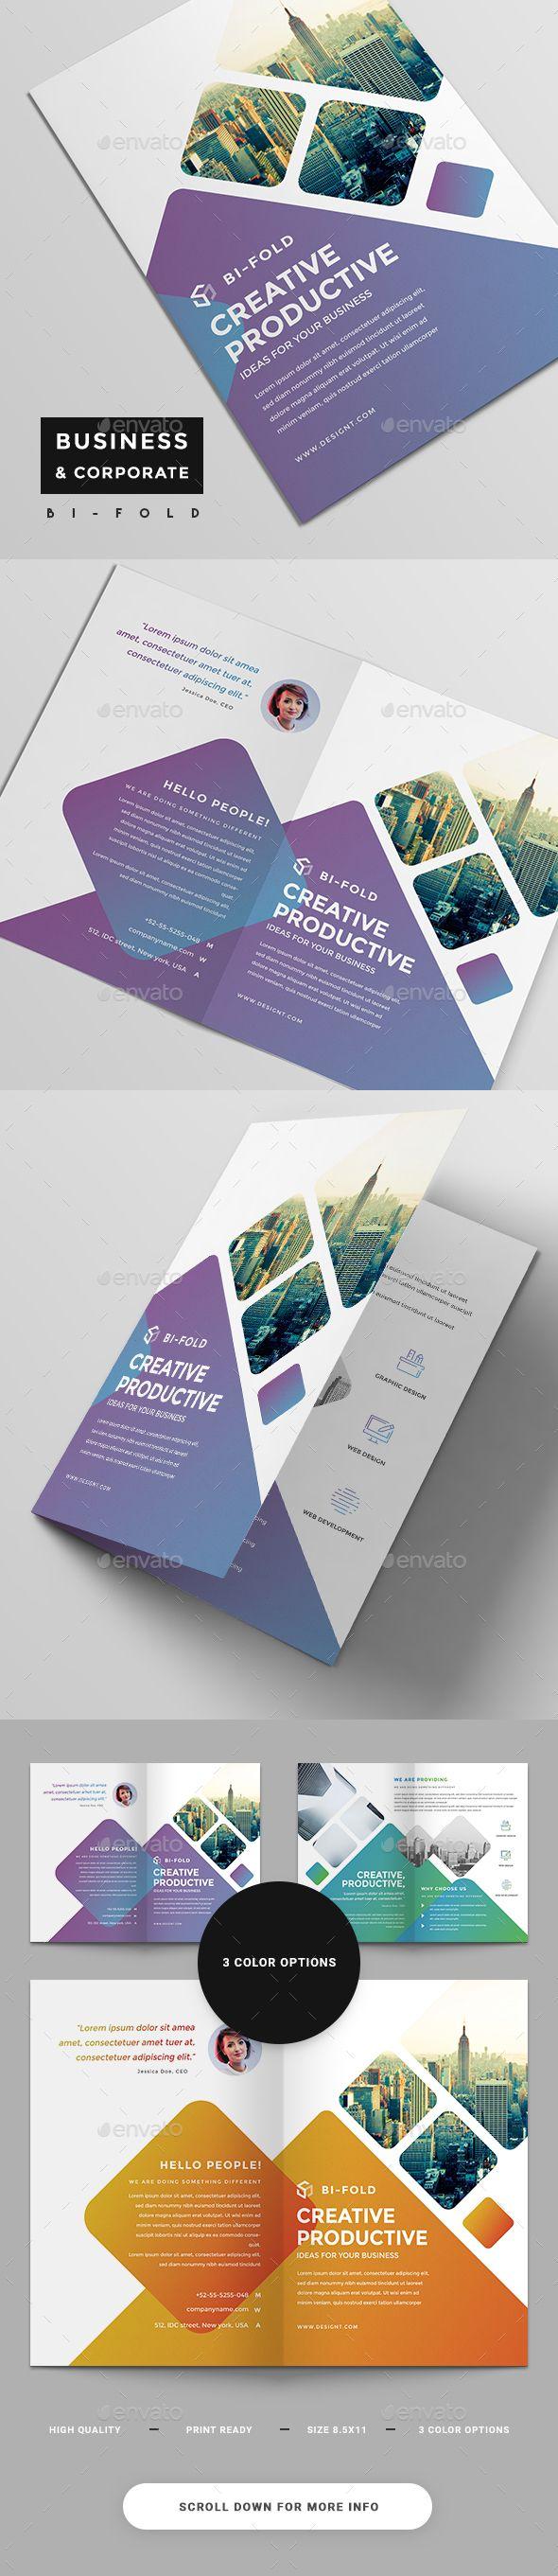 Corporate #Bi-Fold Brochure - #Corporate #Brochures Download here: https://graphicriver.net/item/corporate-bifold-brochure/19332651?ref=alena994